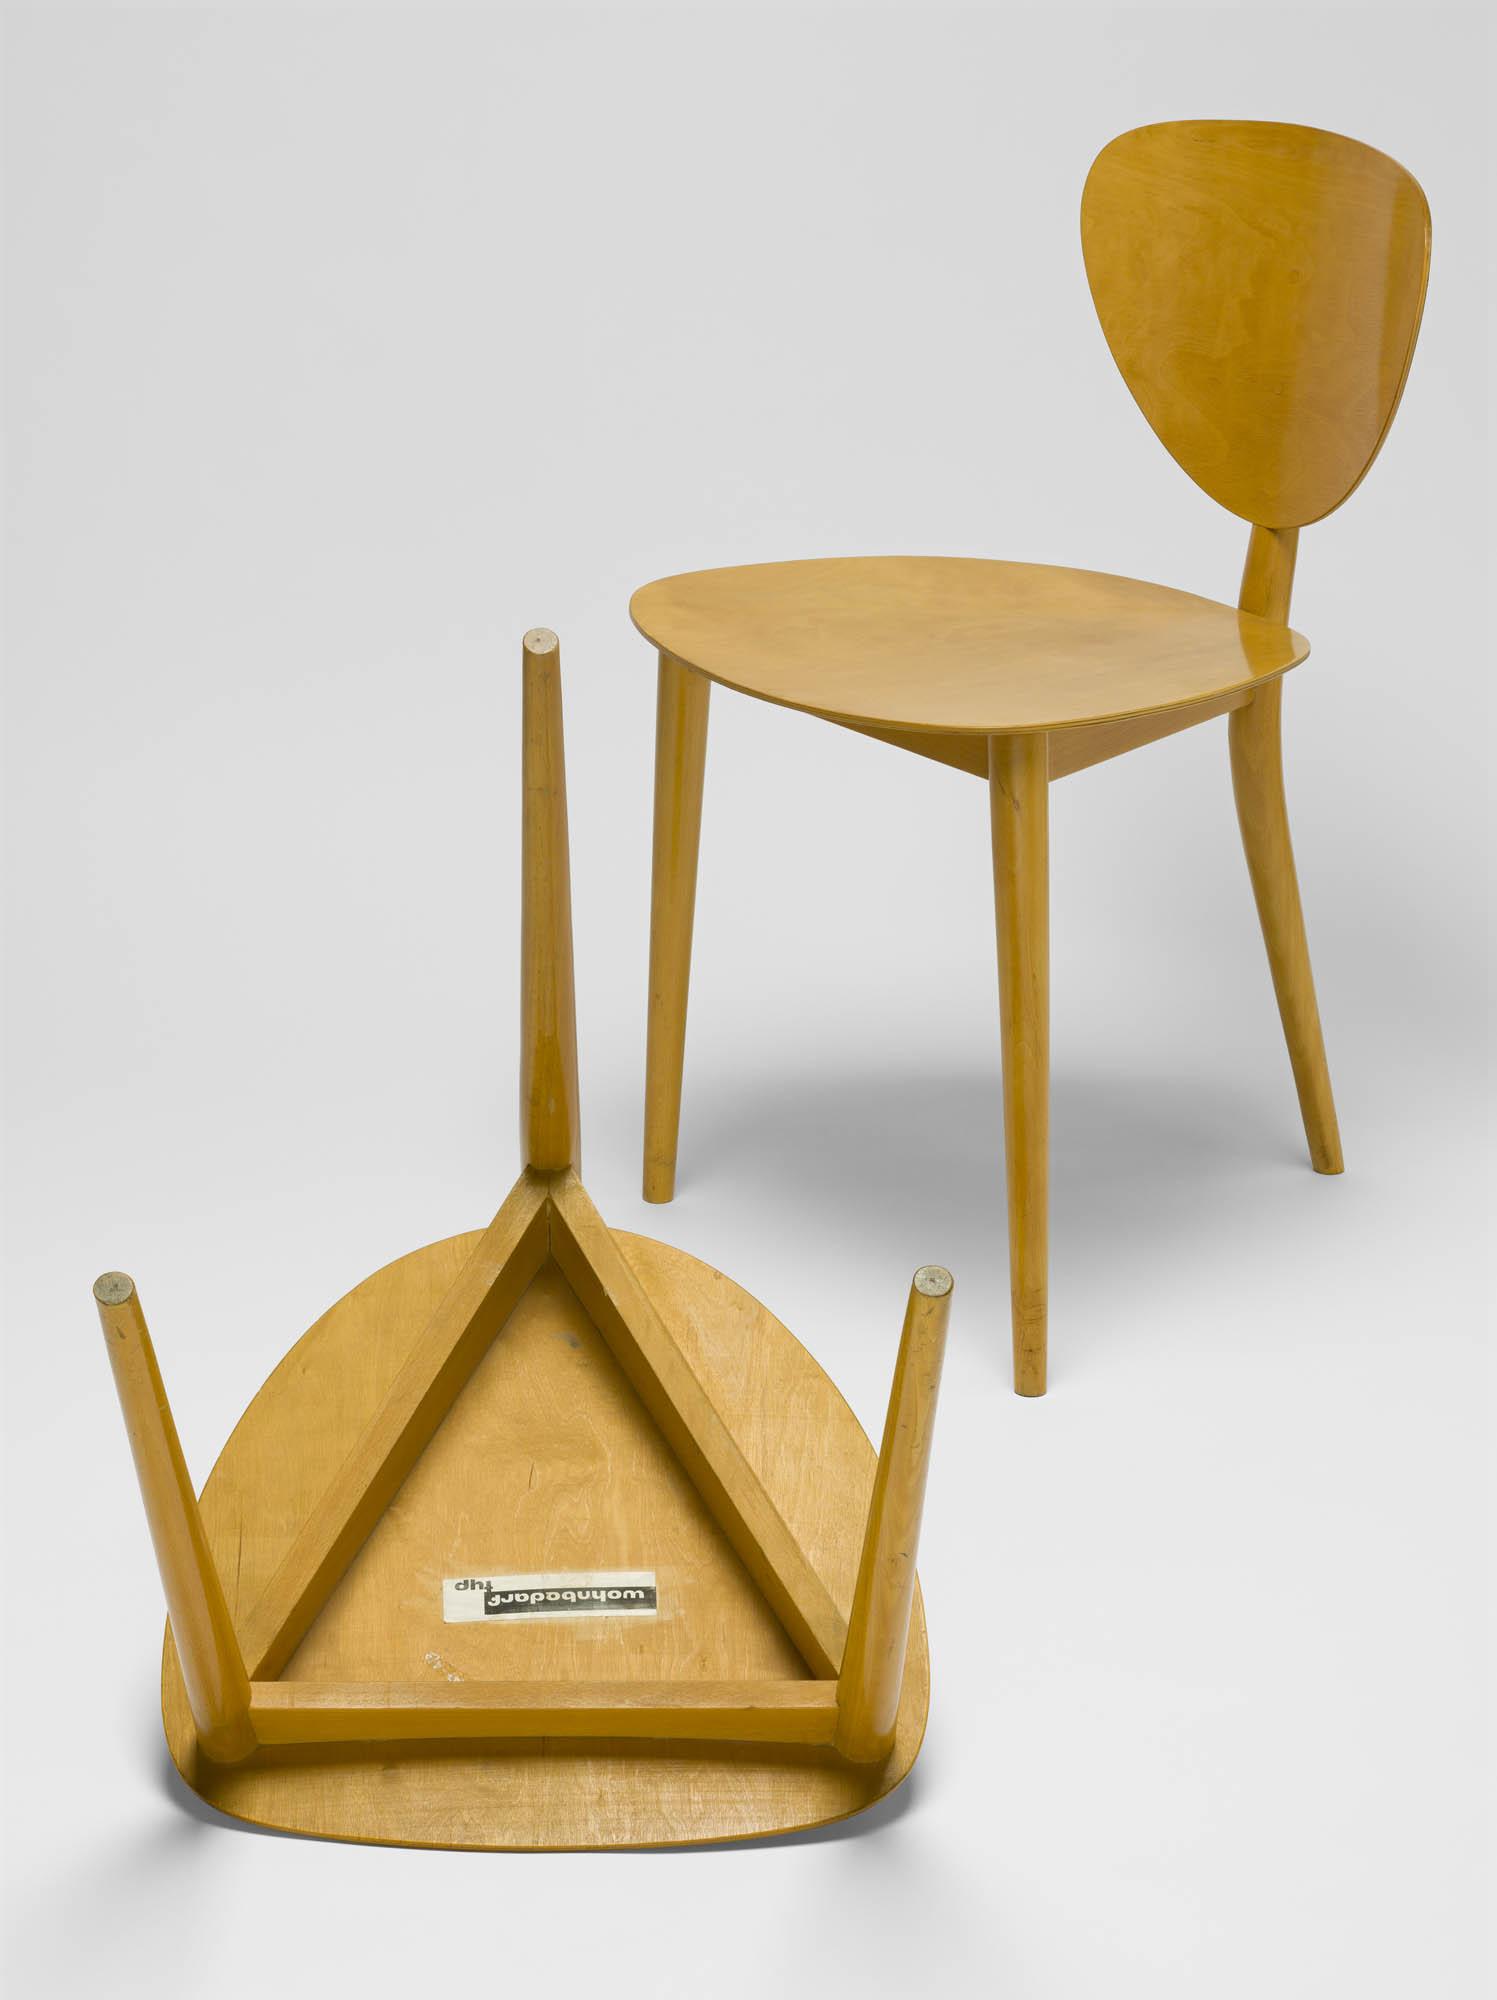 Dreibeinstuhl Max Bill Chair